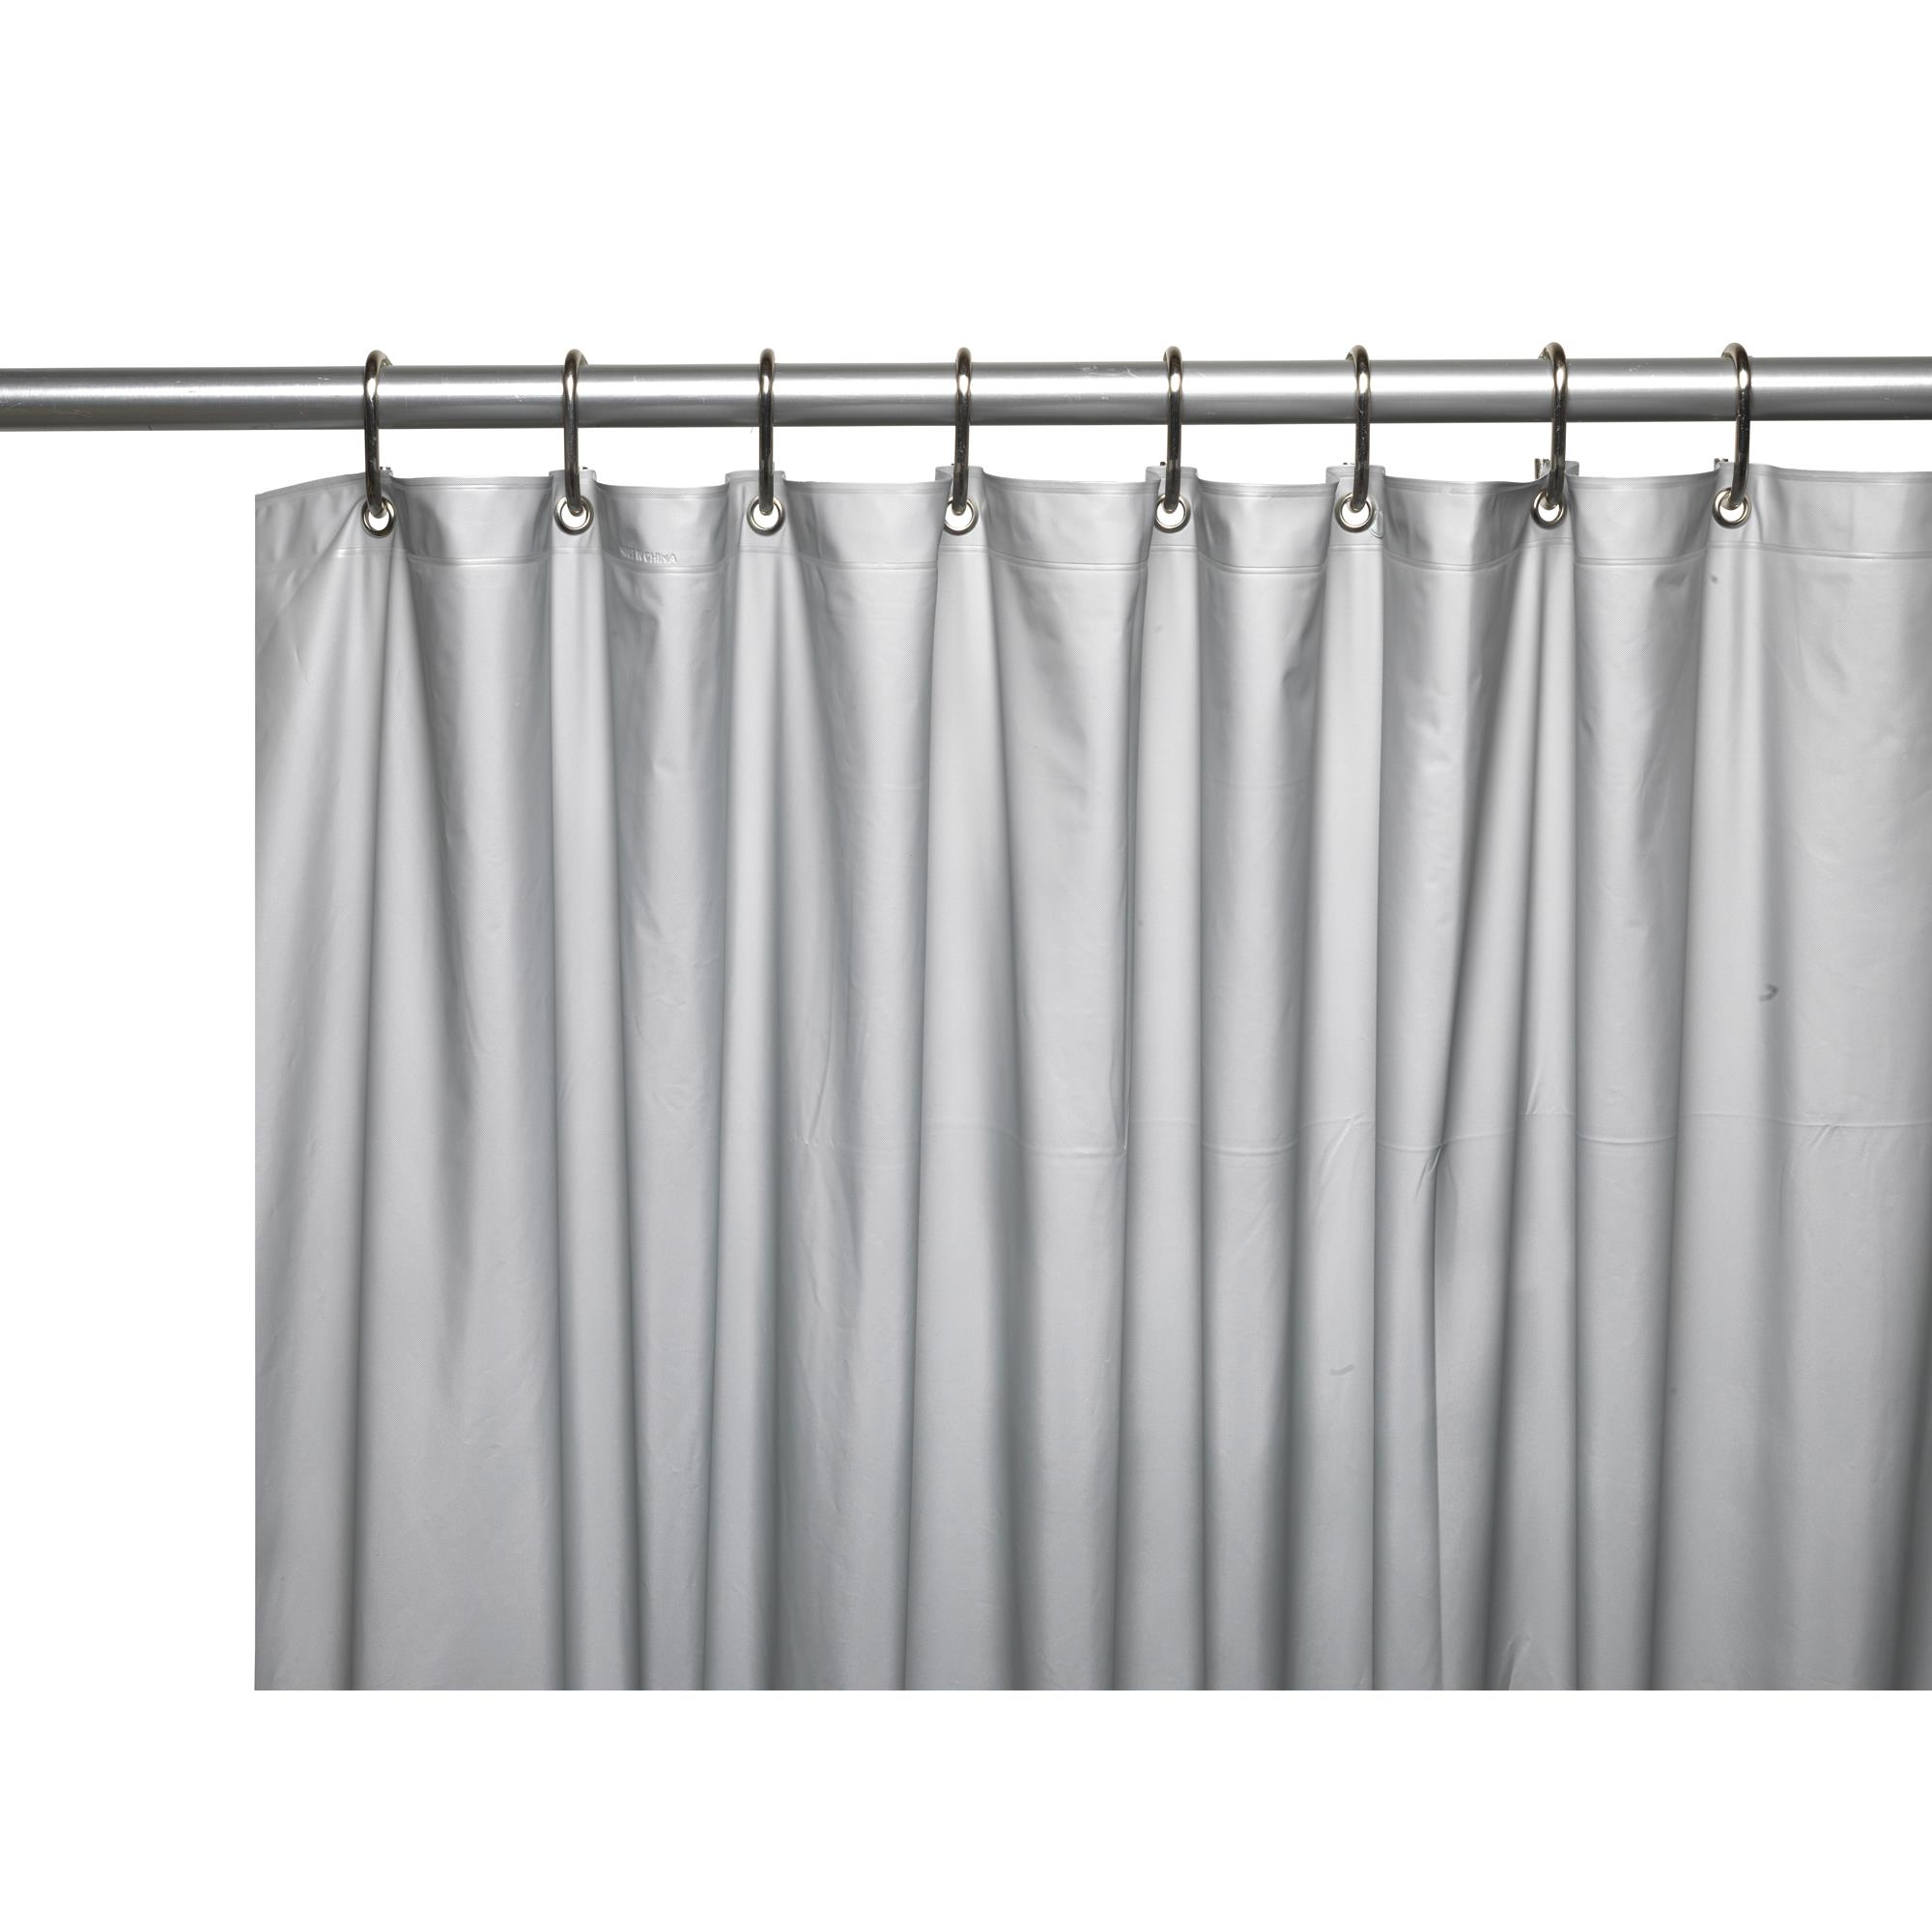 Carnation 3 Gauge Vinyl Shower Curtain Liner Weighted Grommets